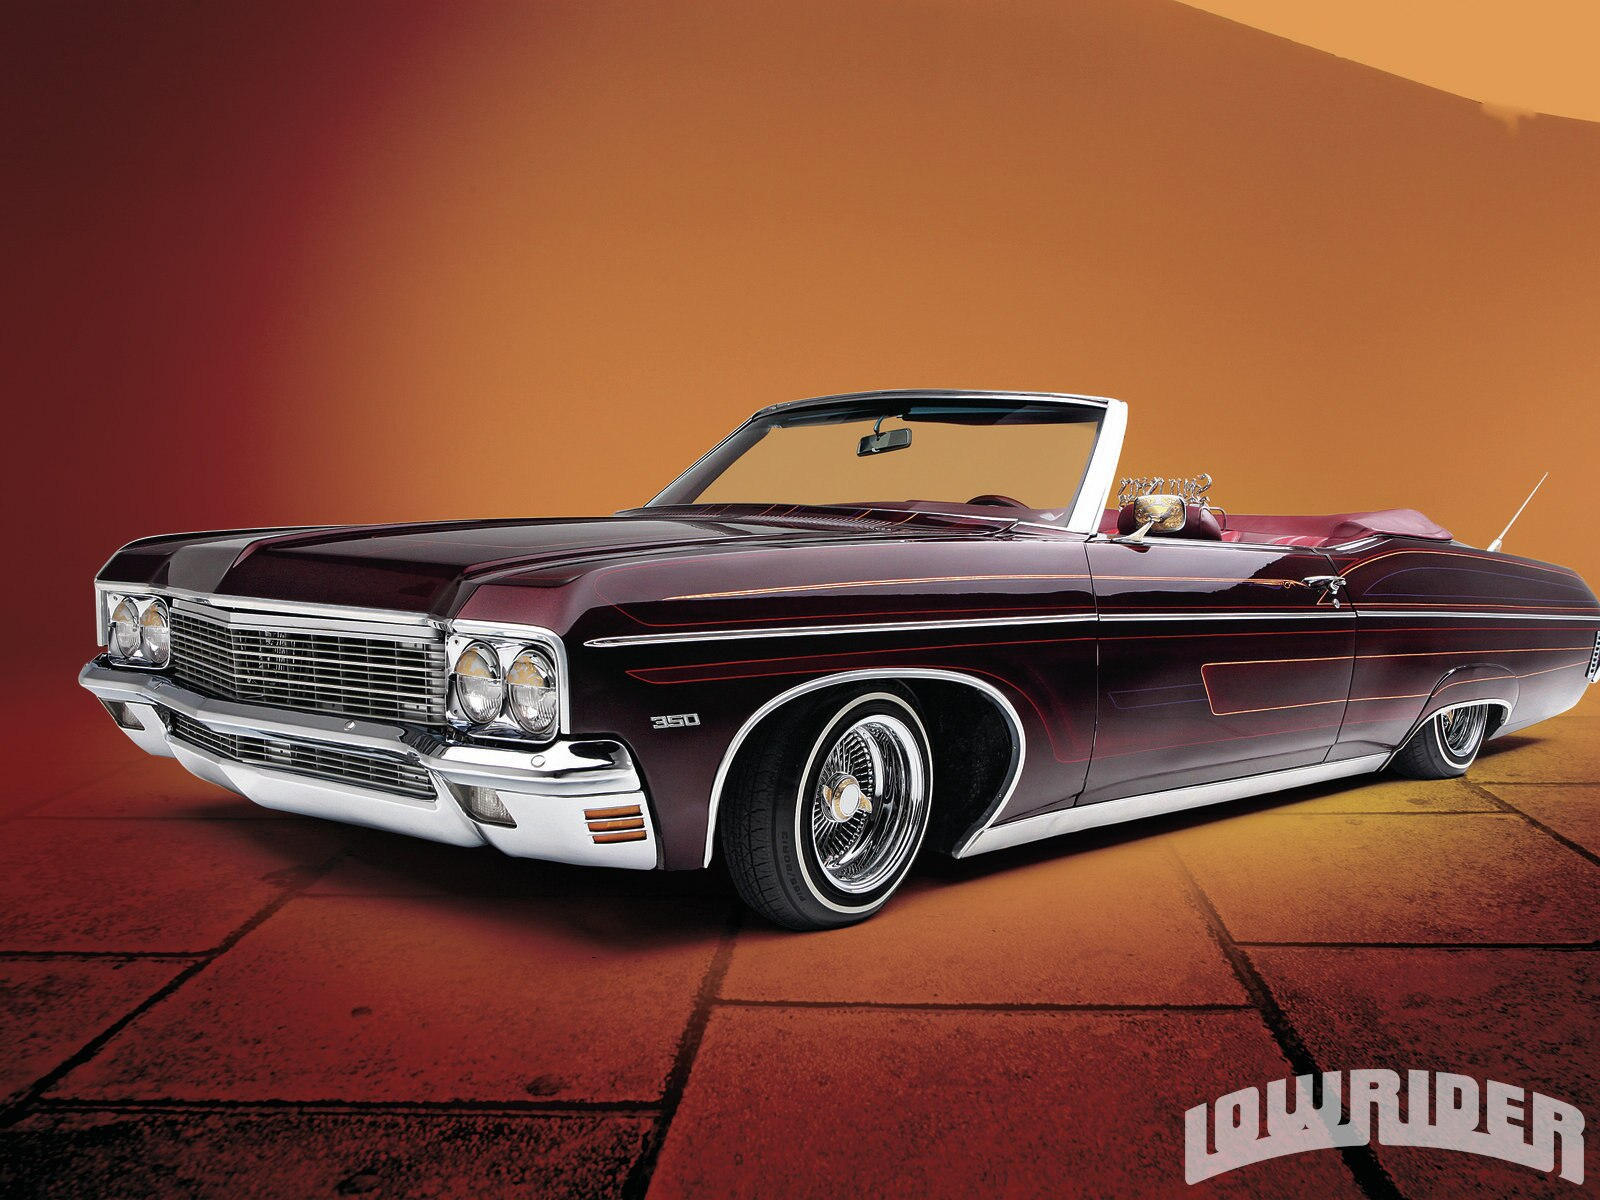 1970 chevrolet impala convertible lowrider magazine 217 sciox Images